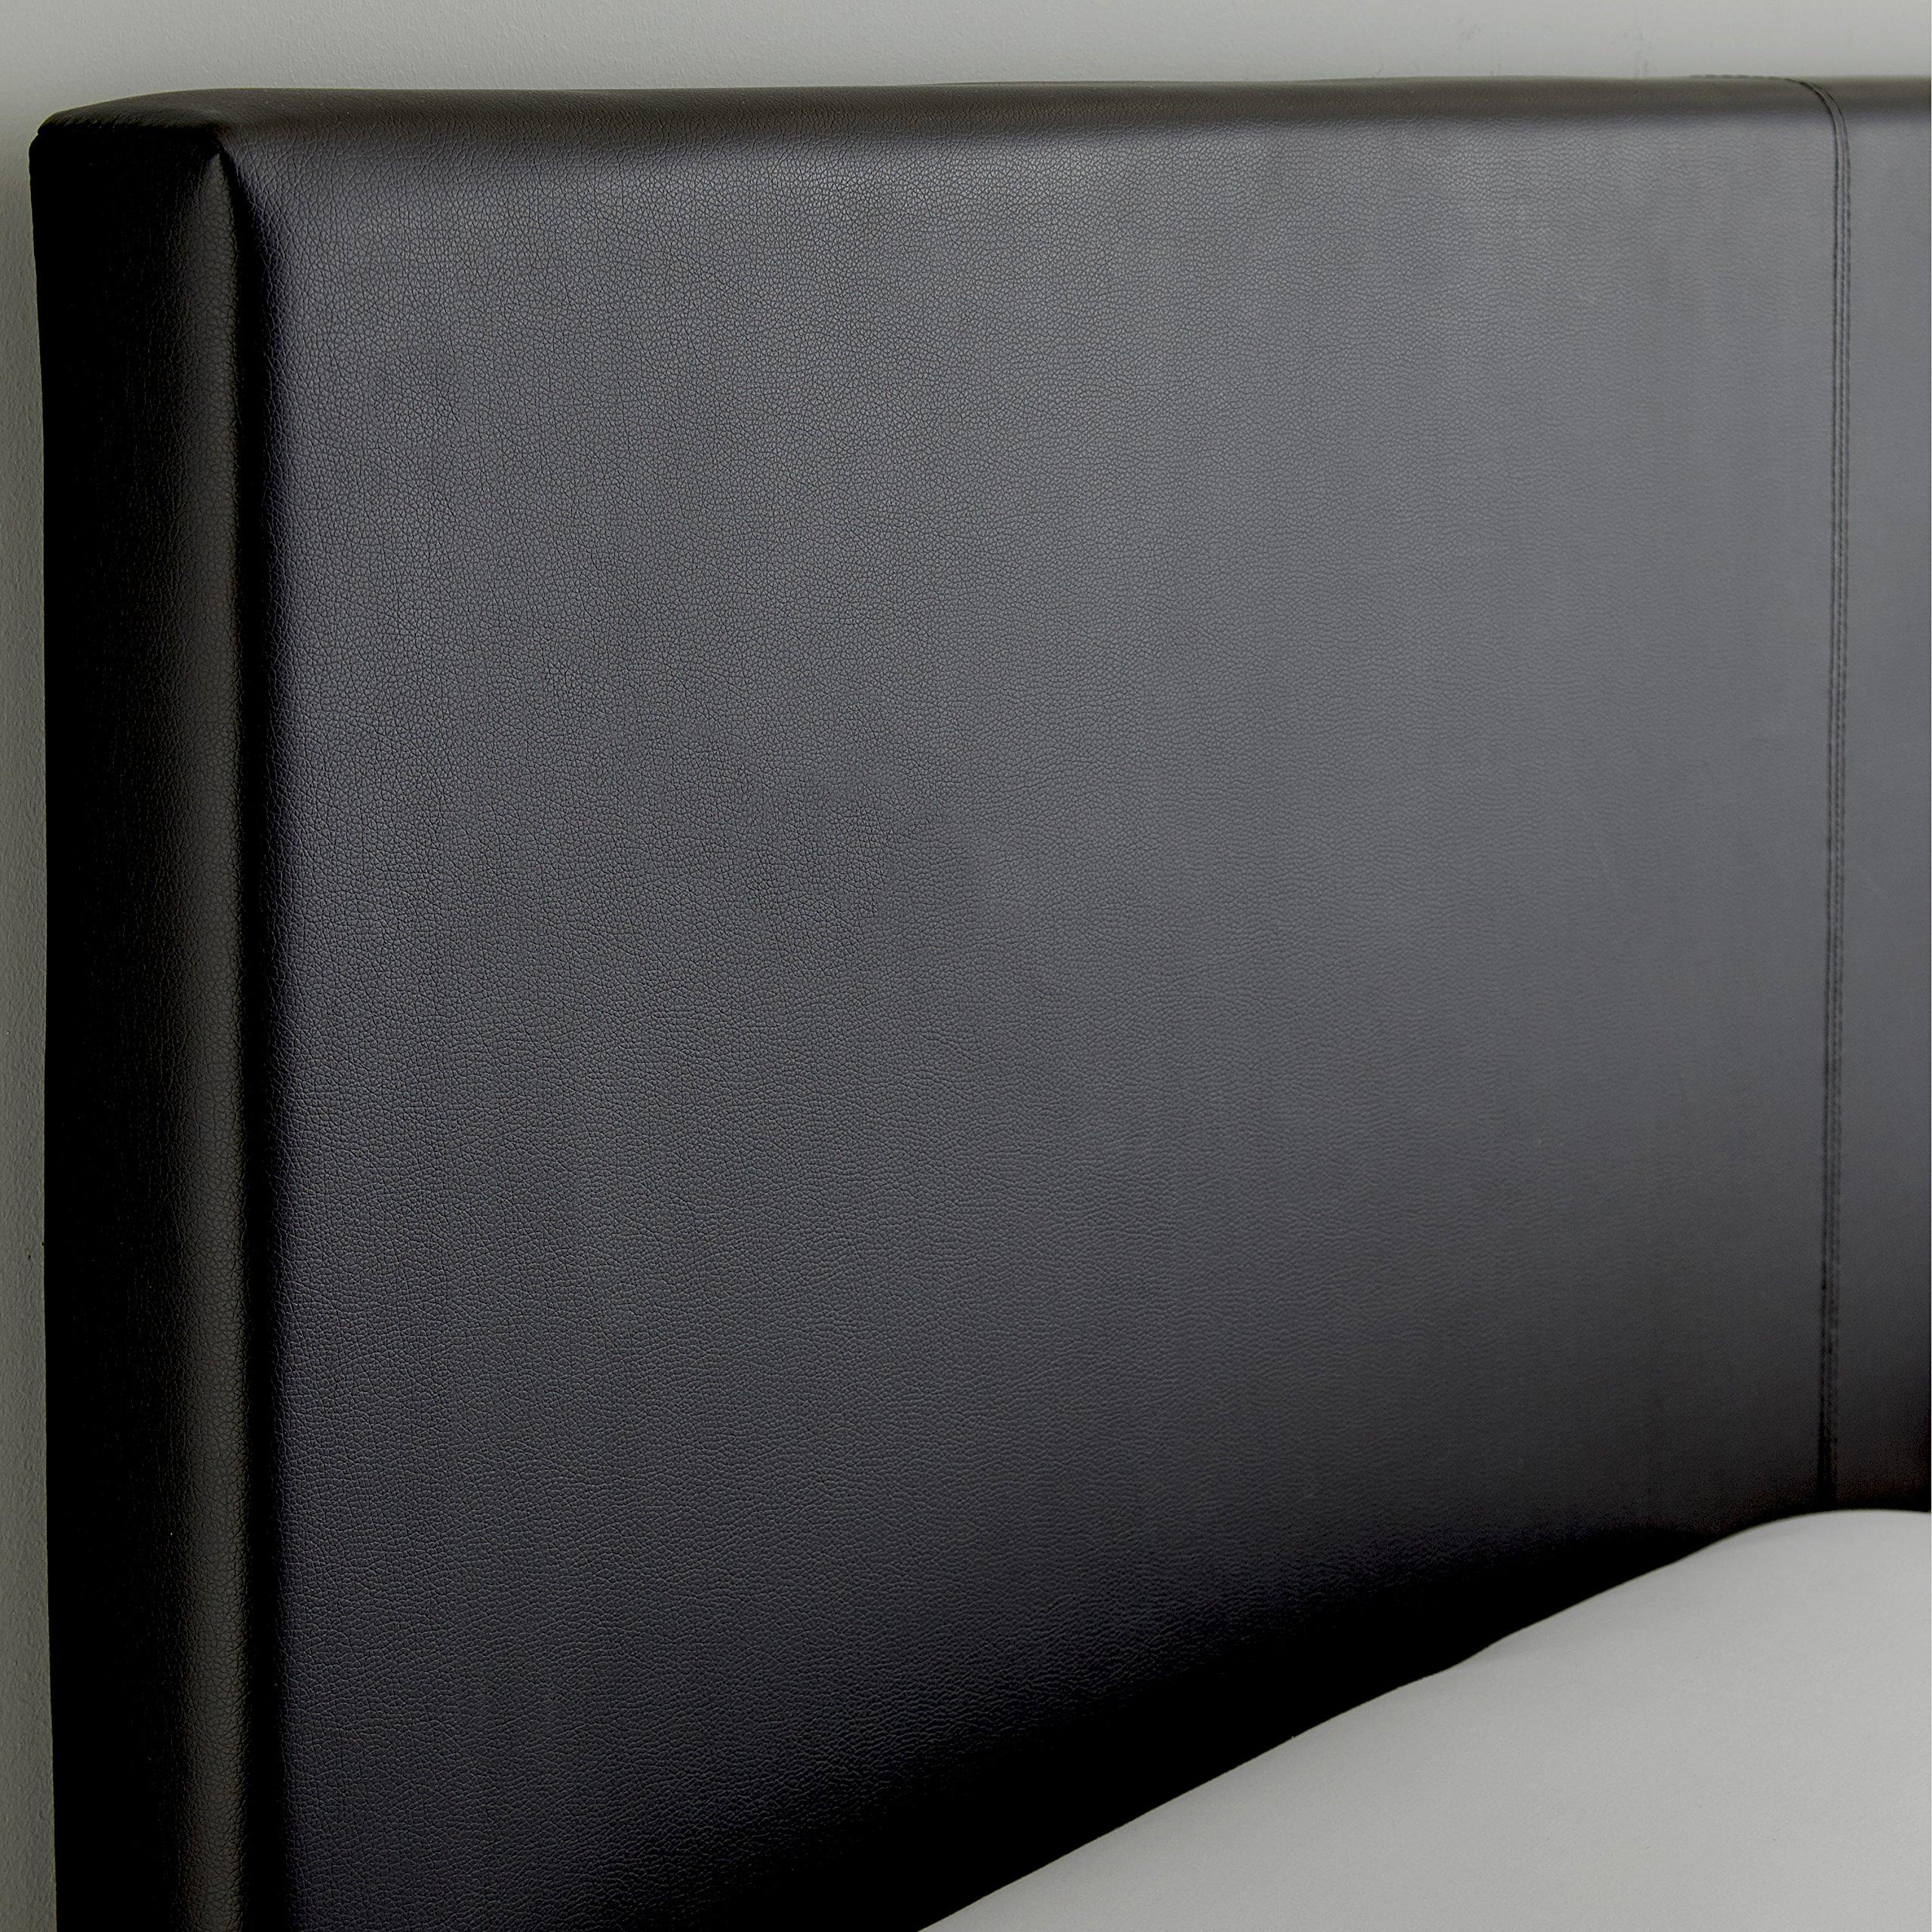 Flex Form Montana Upholstered Platform Bed Frame with Headboard: Faux Leather, Black, Full by Flex Form (Image #3)